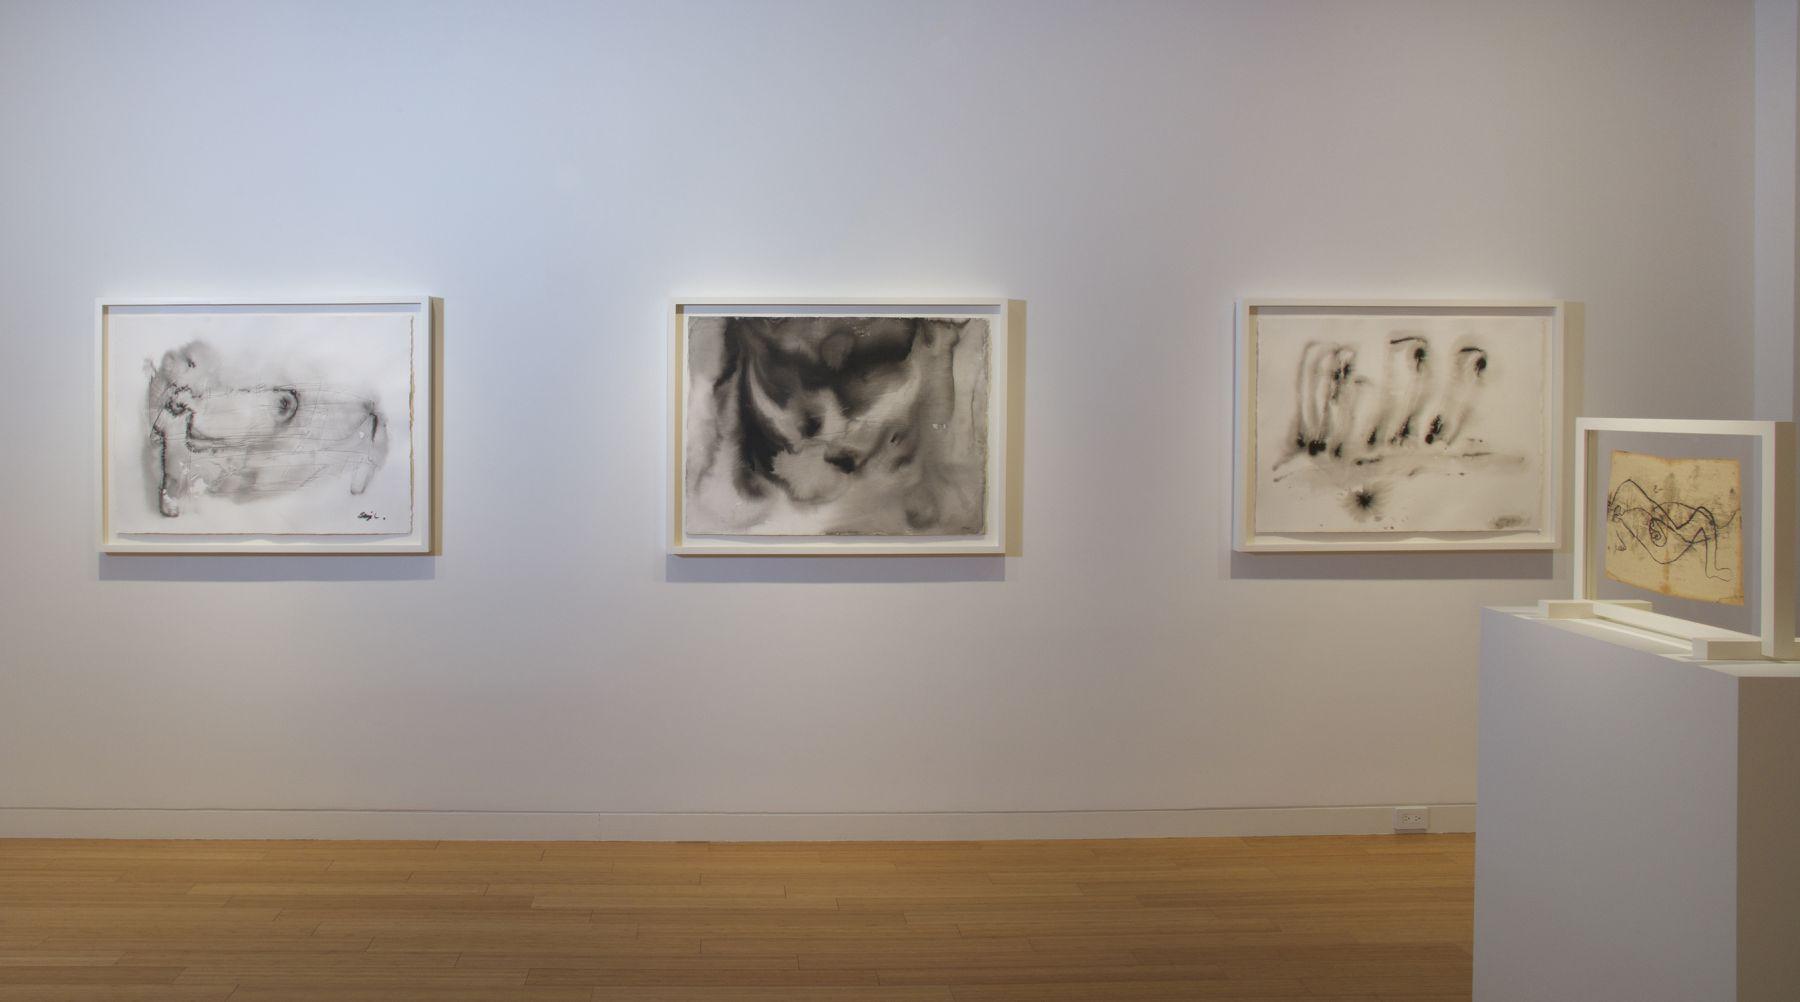 Whitney McVeigh: Elegy to Nature